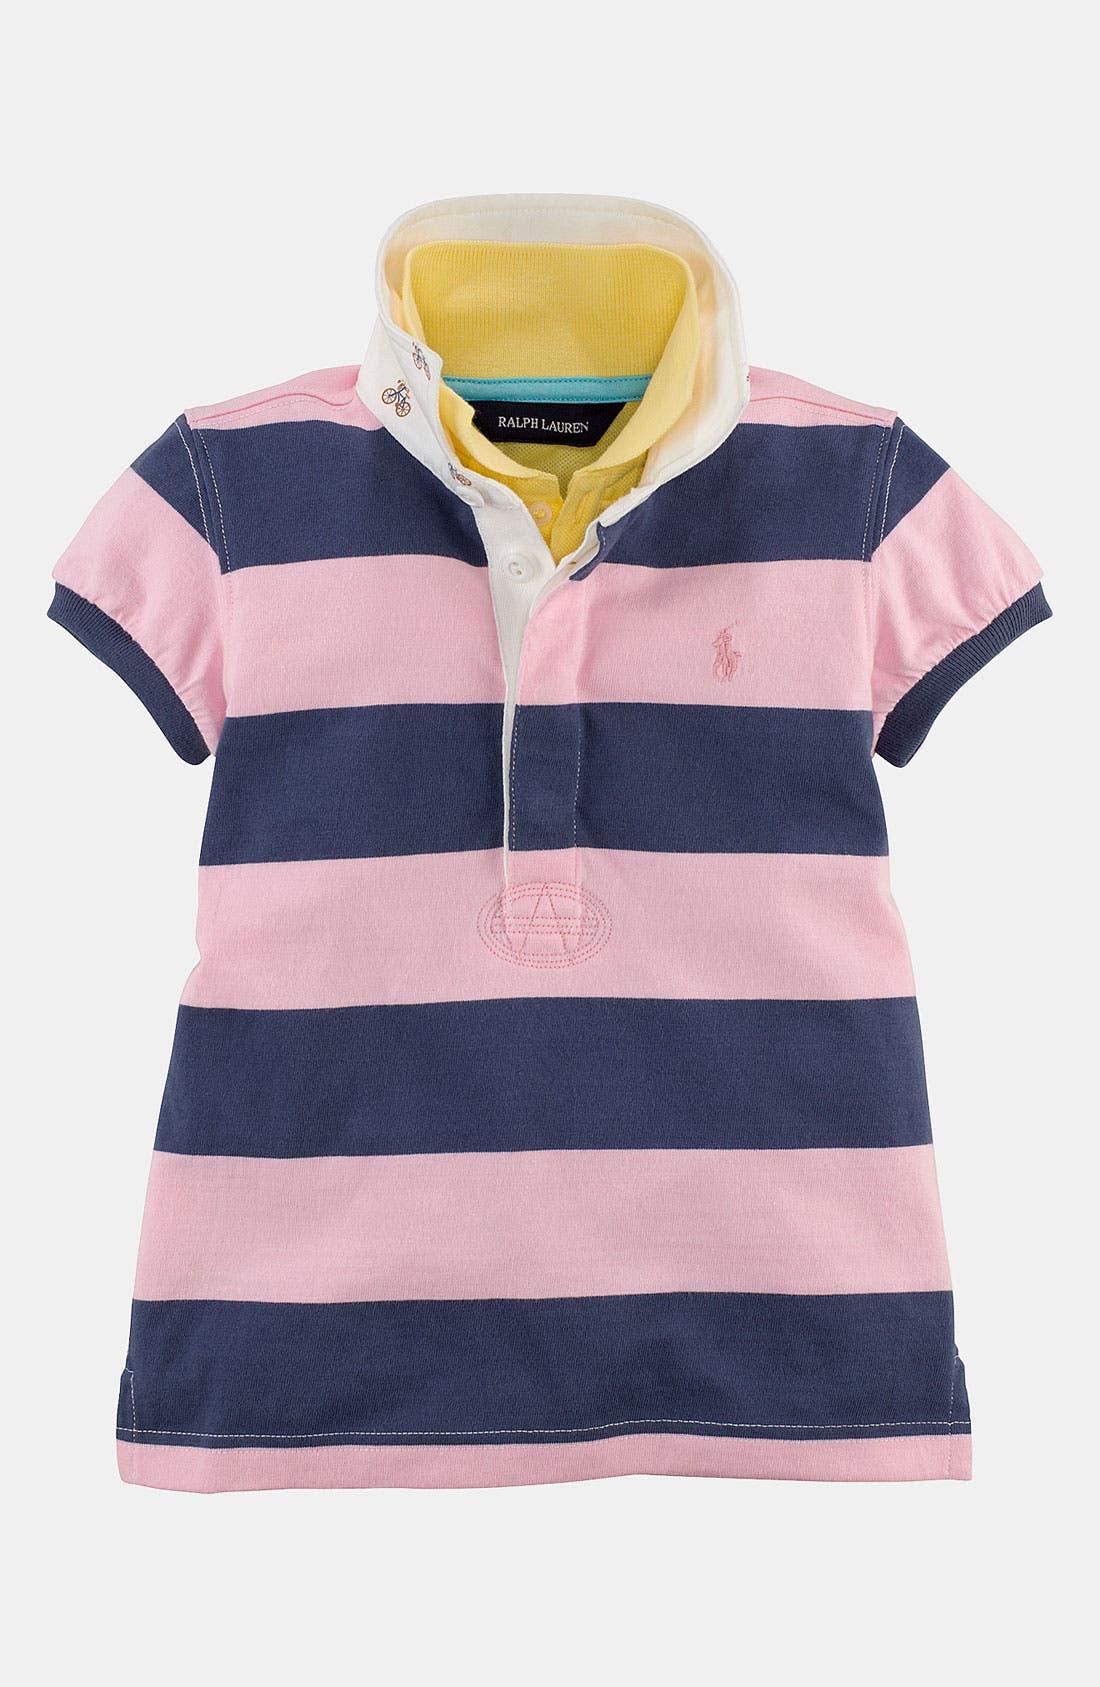 Alternate Image 1 Selected - Ralph Lauren Stripe Shirt (Toddler)